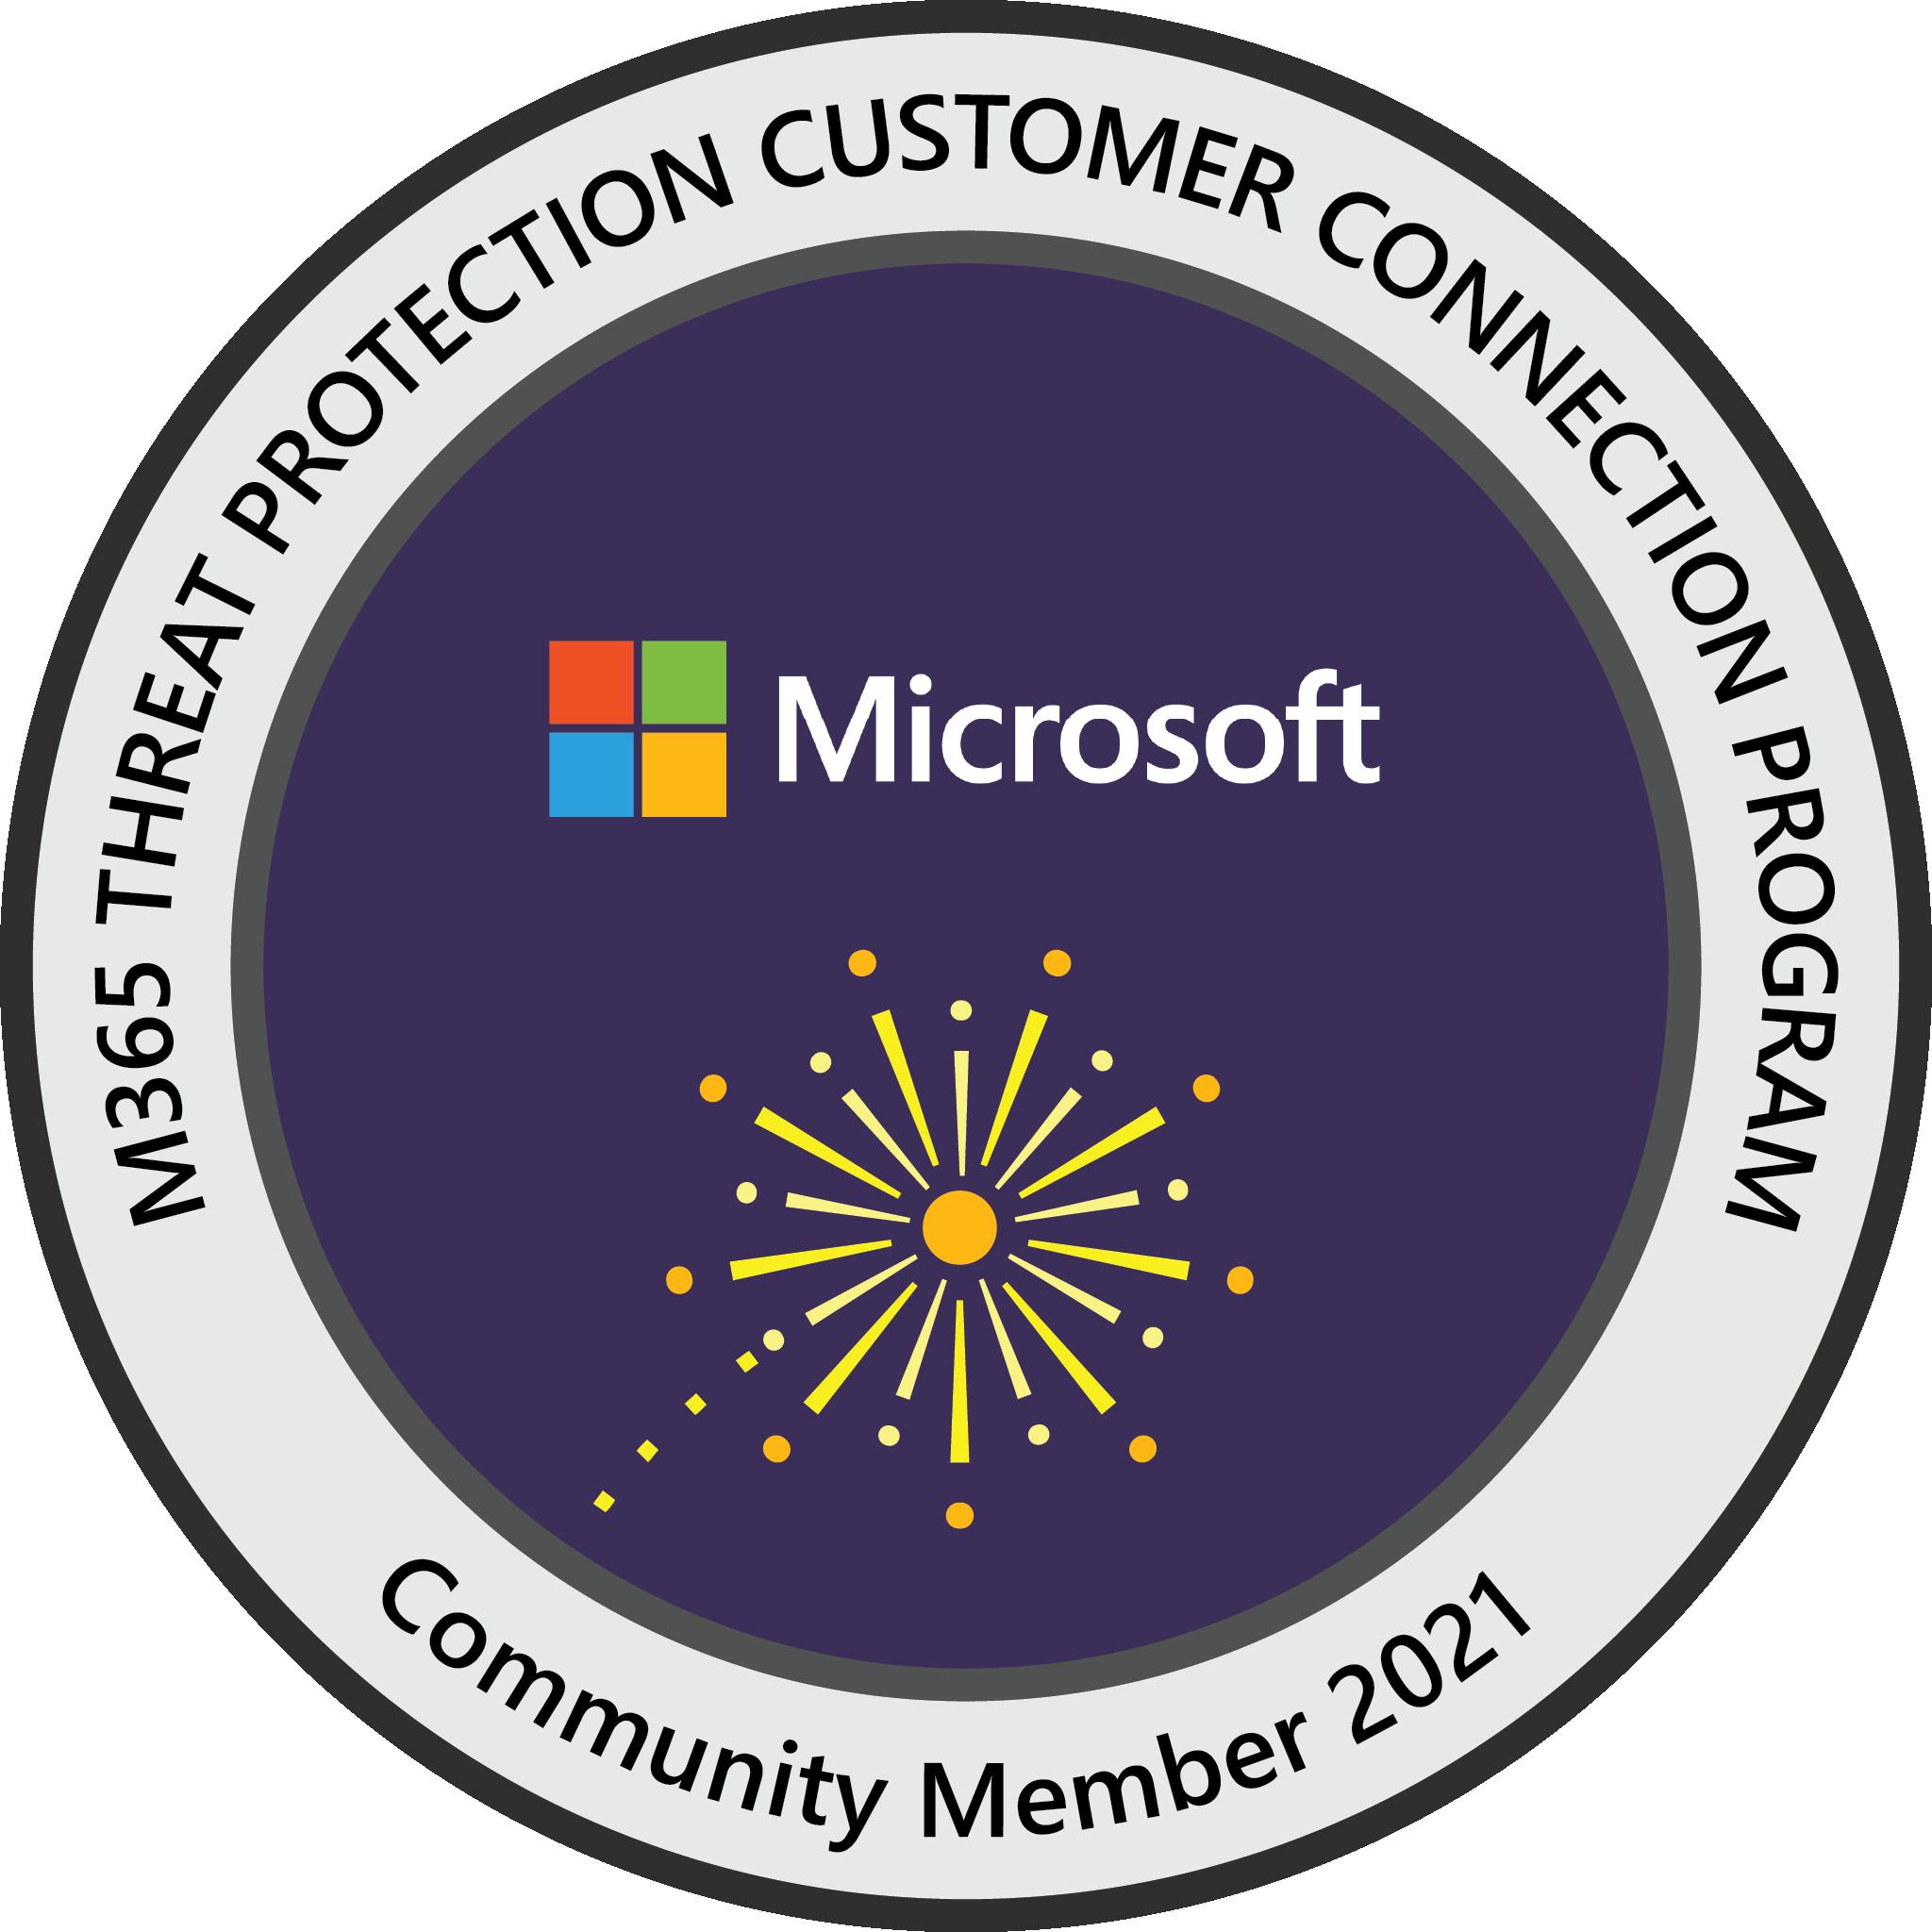 Microsoft 365 Threat Protection Customer Connection Program: Community Member 2021